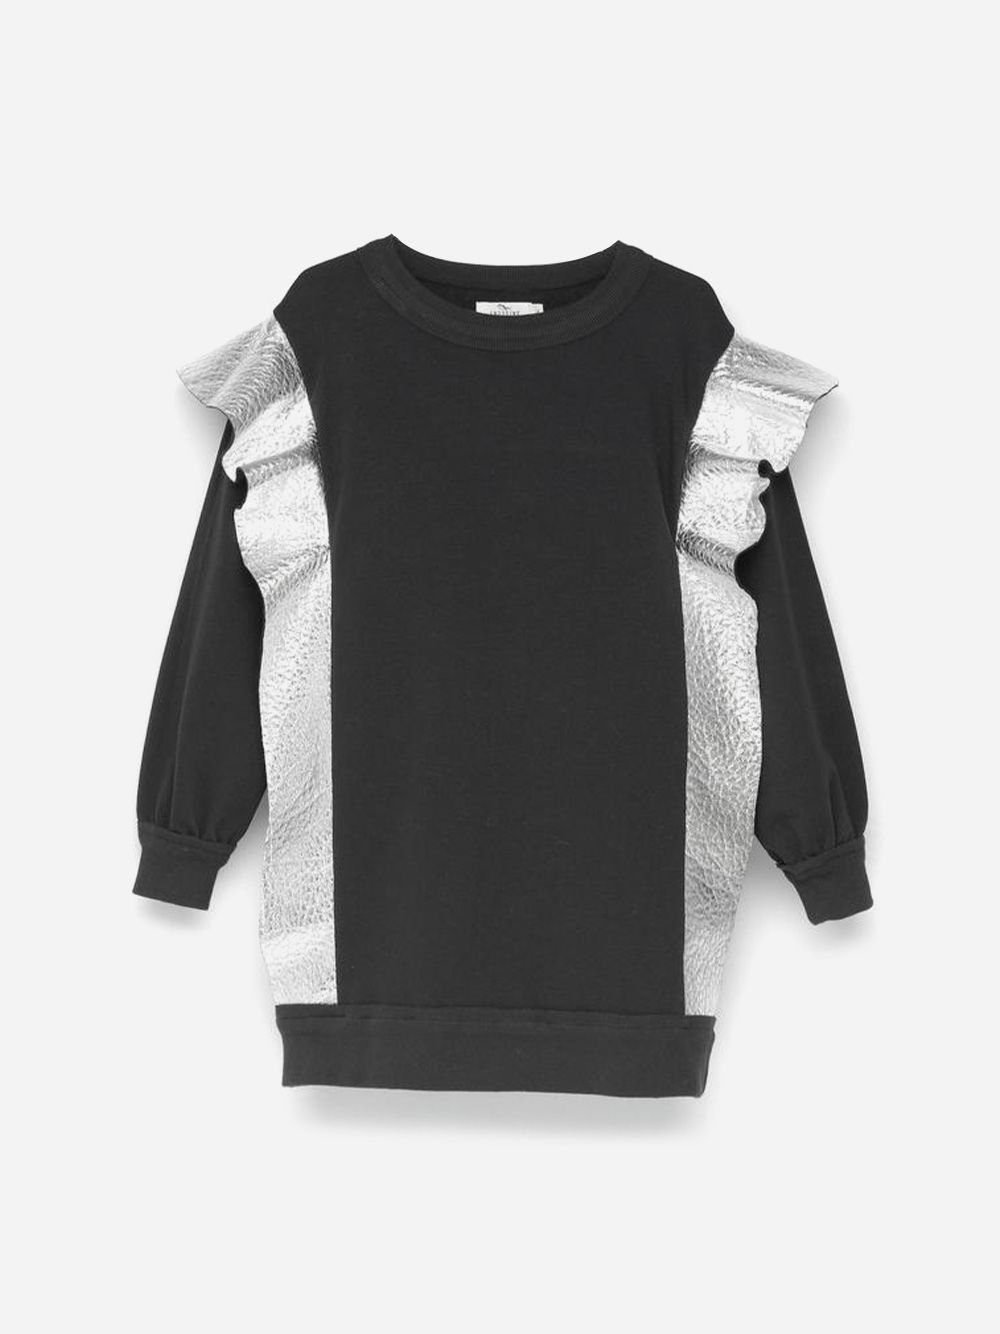 Embellished Sweaterdress Black